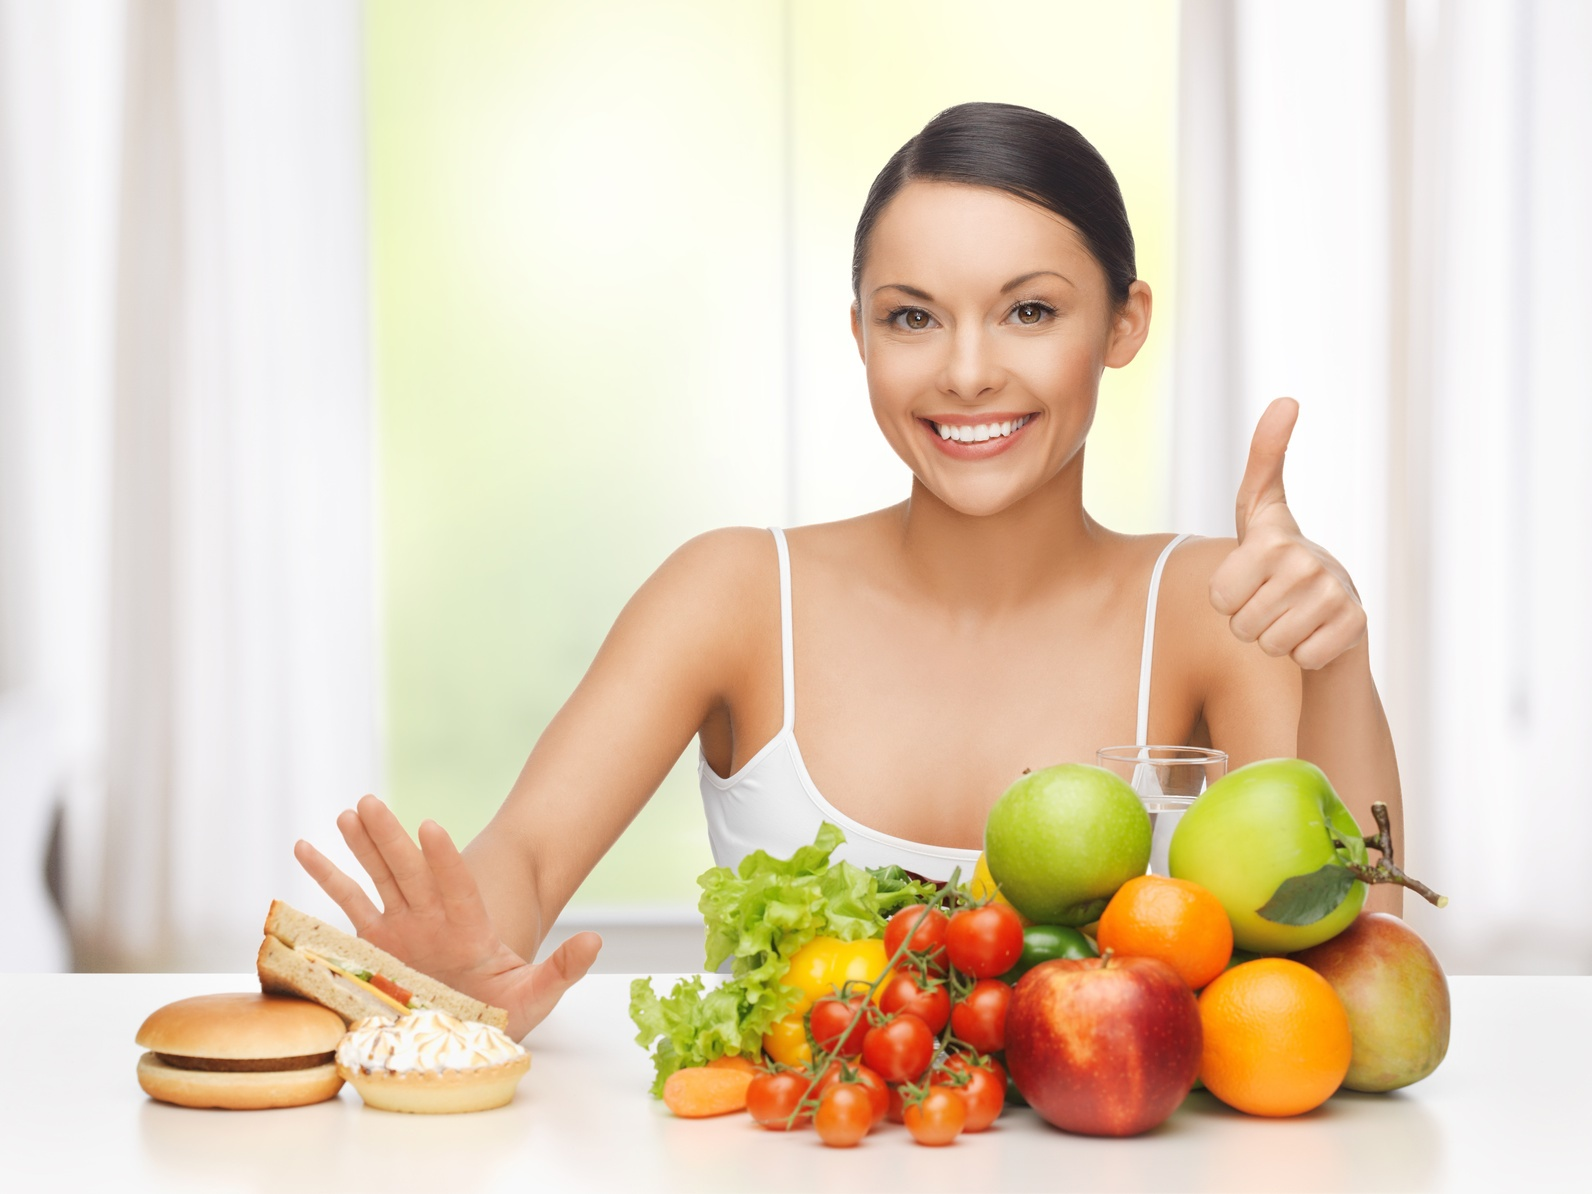 Top 5 Detox Diets